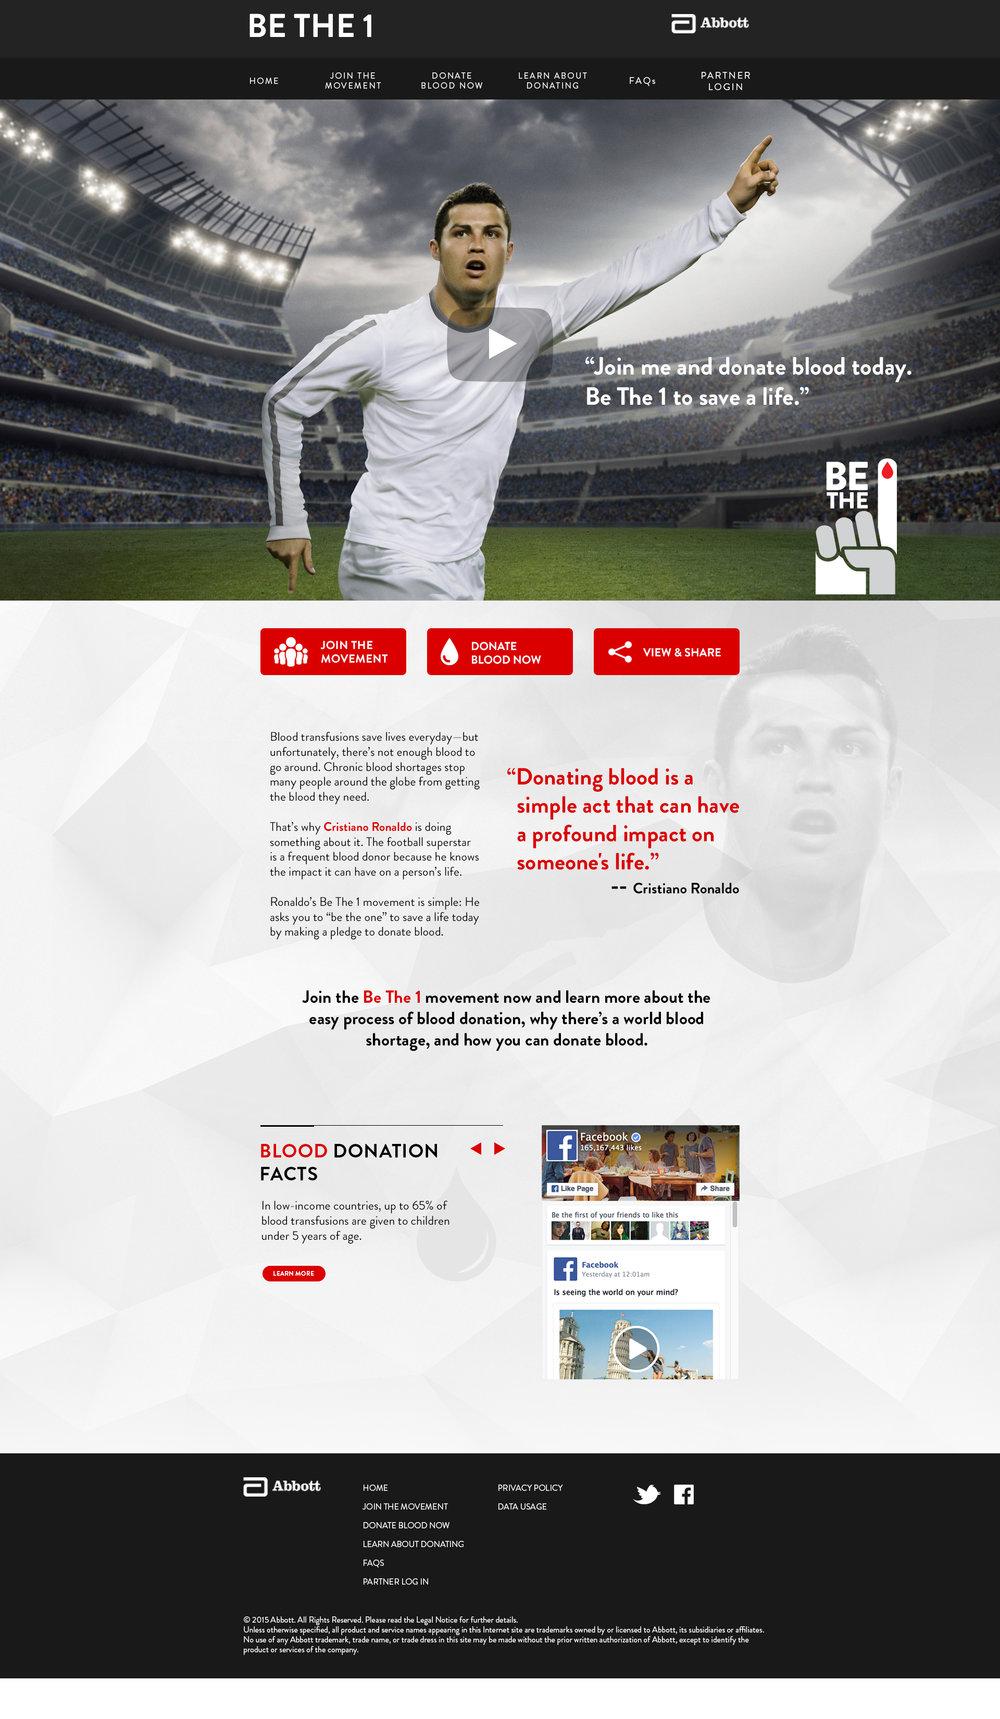 beTheOne_homepage8.jpg